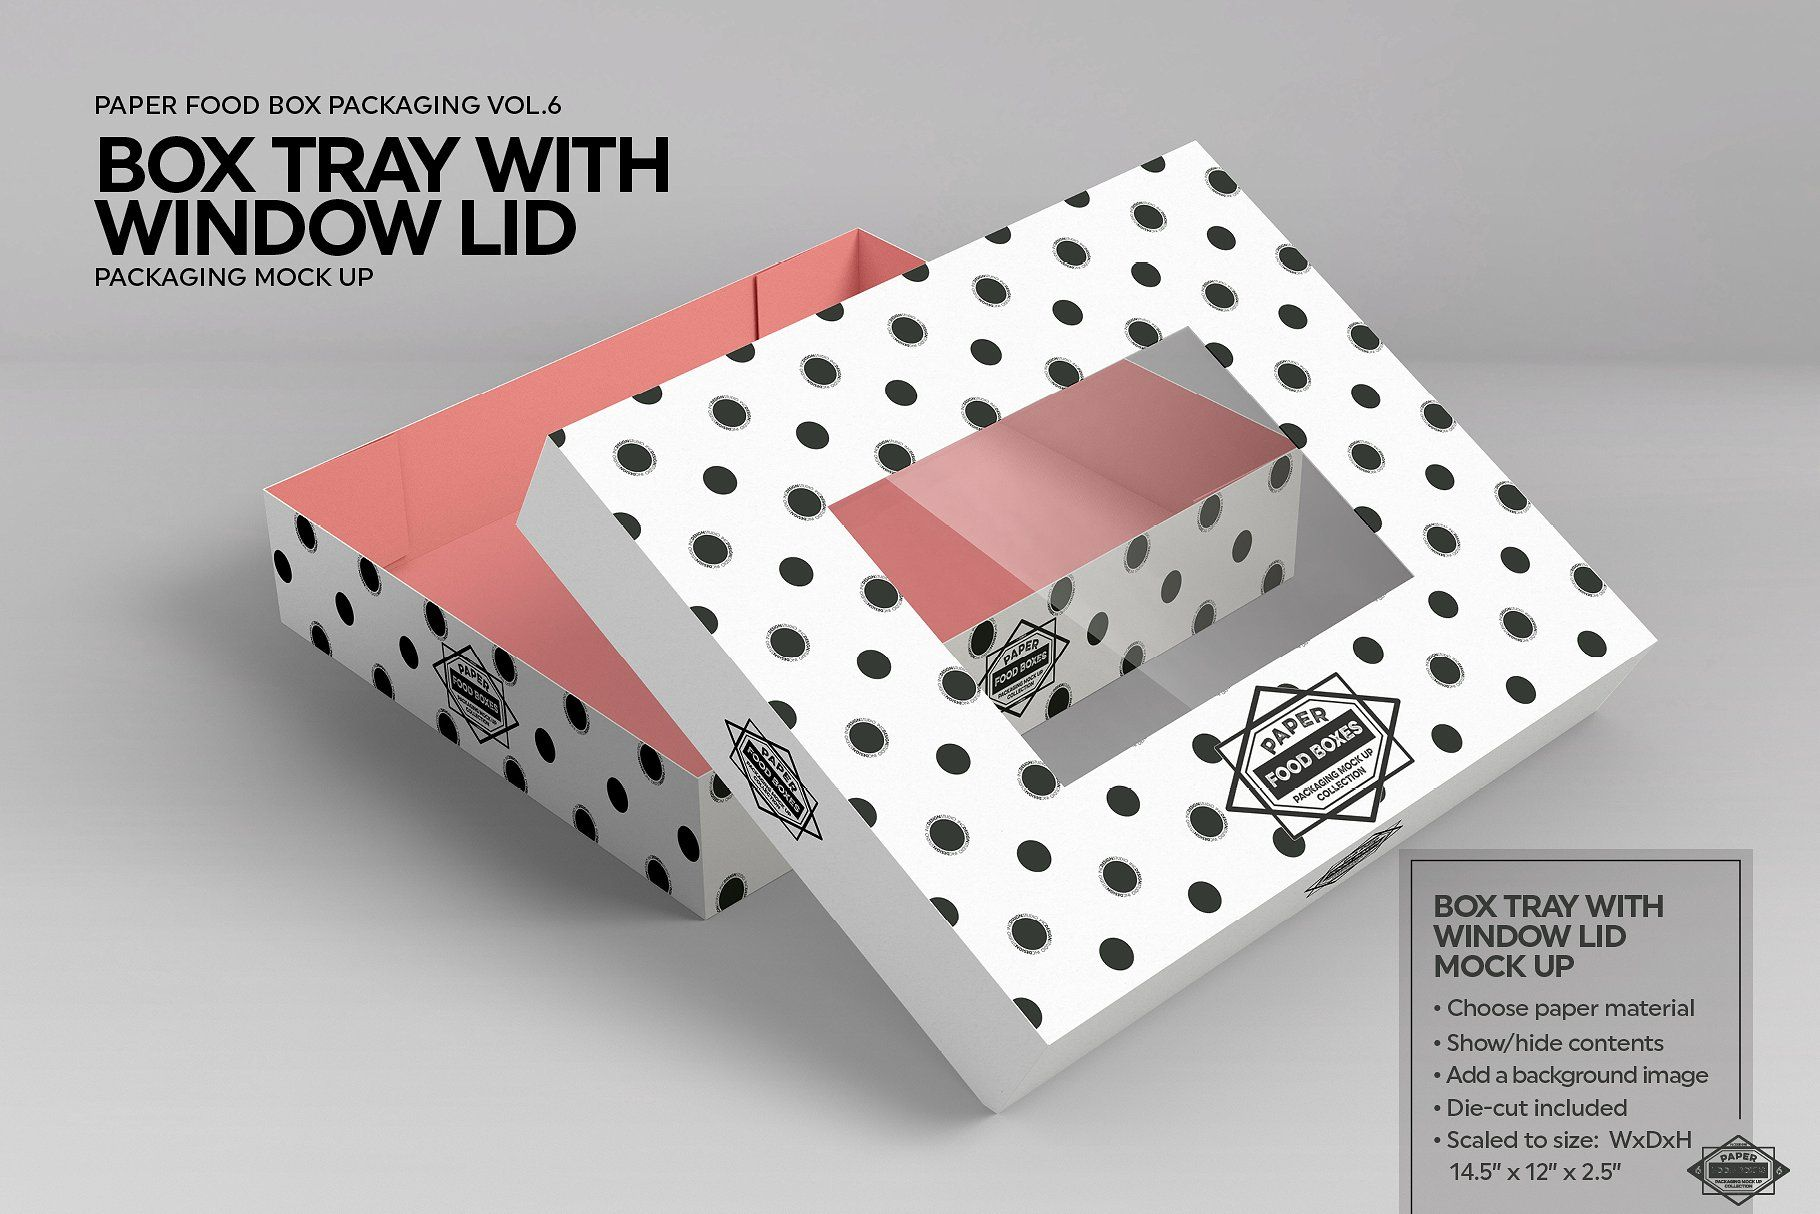 Download Box Tray Window Lid Packaging Mockup Packaging Mockup Free Packaging Mockup Food Box Packaging